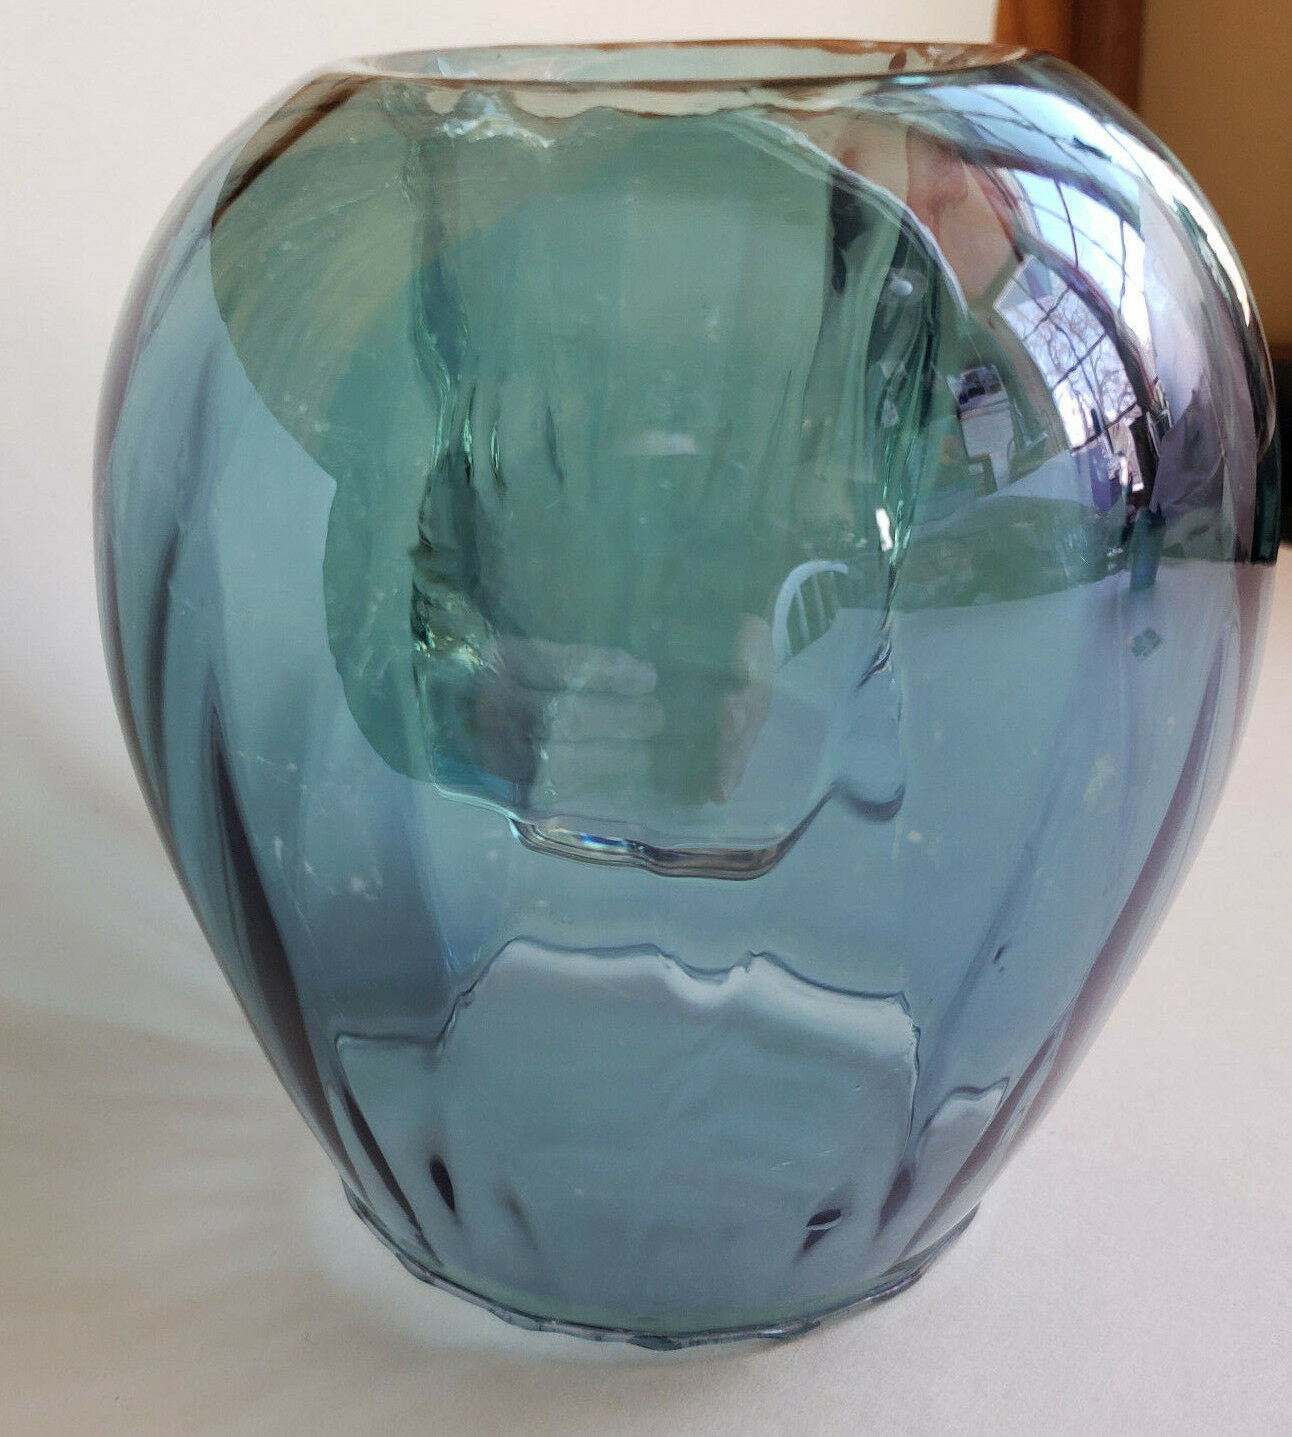 Easter Teal Odyssey Candle Holder Hand-blown Glass Tealight Votive PartyliteVtg